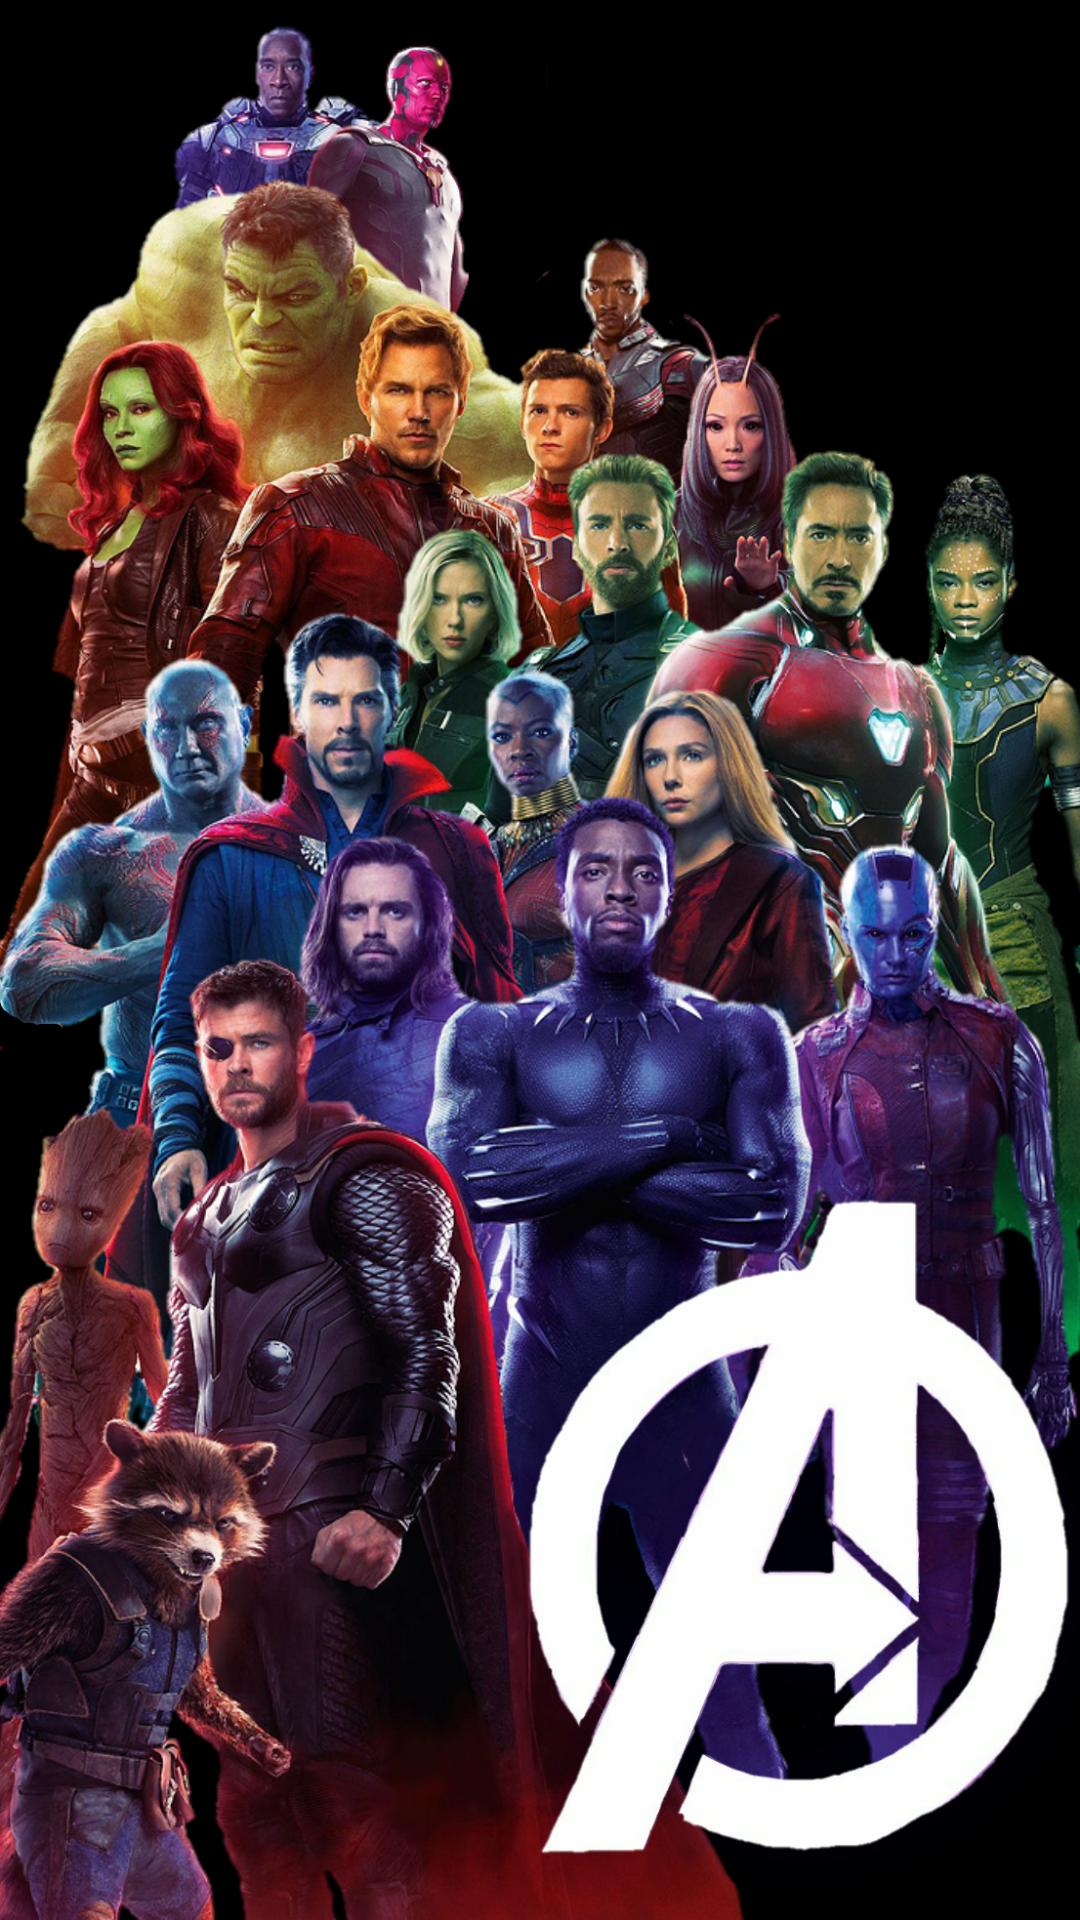 2 Avengers Infinity War Tumblr Marvel Infinity War Marvel Posters Marvel Superheroes